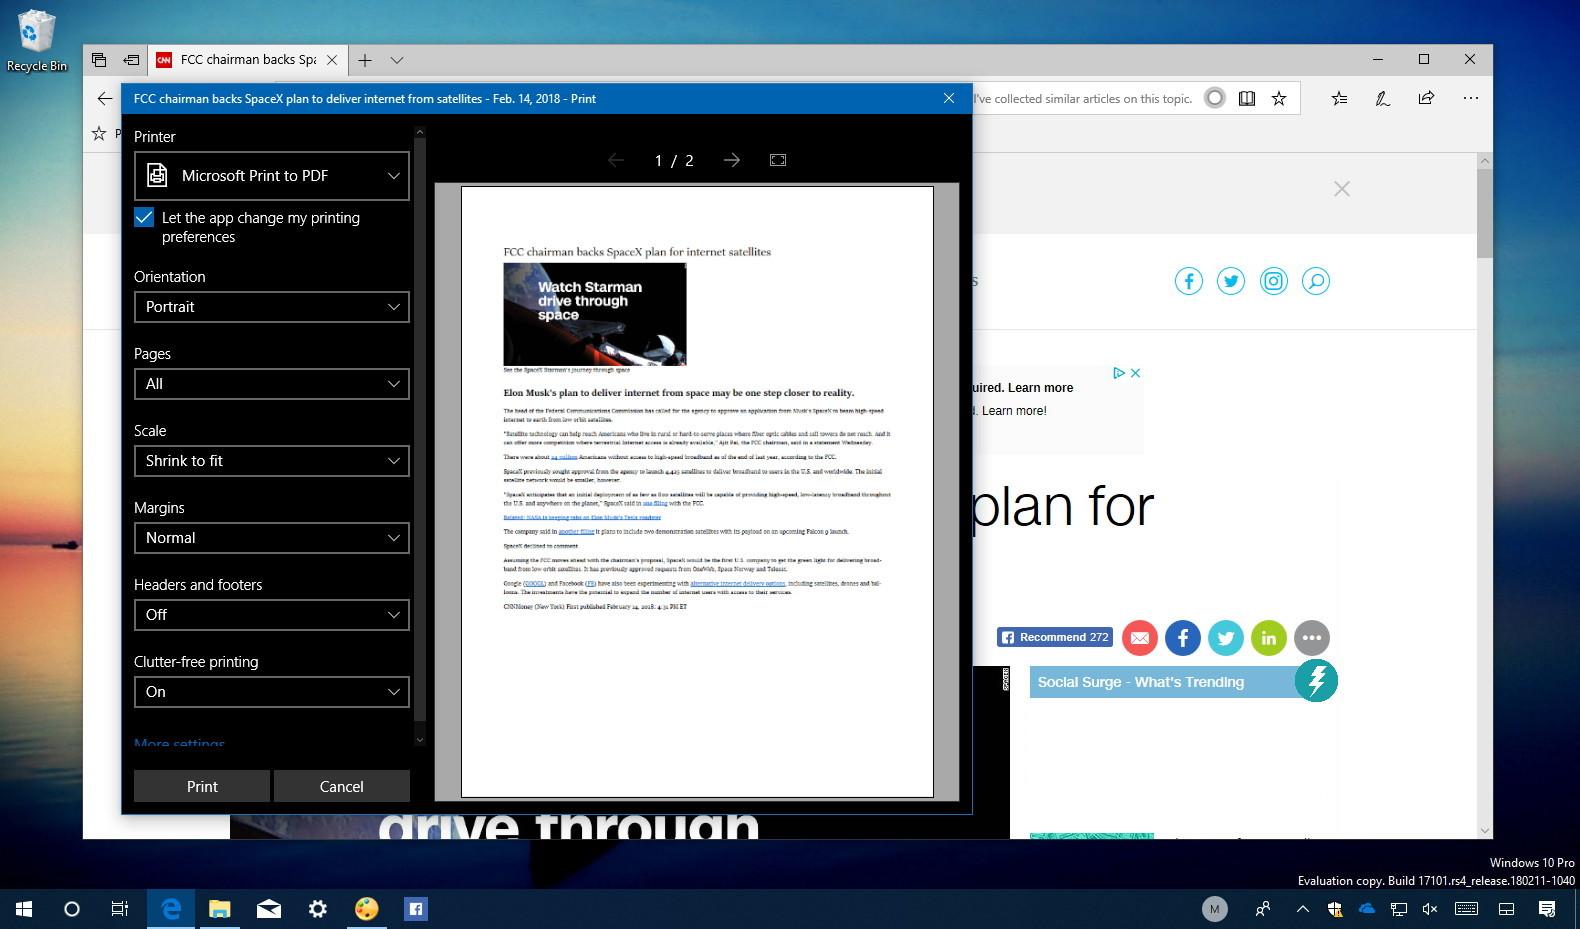 Microsoft Edge Clutter-free printing